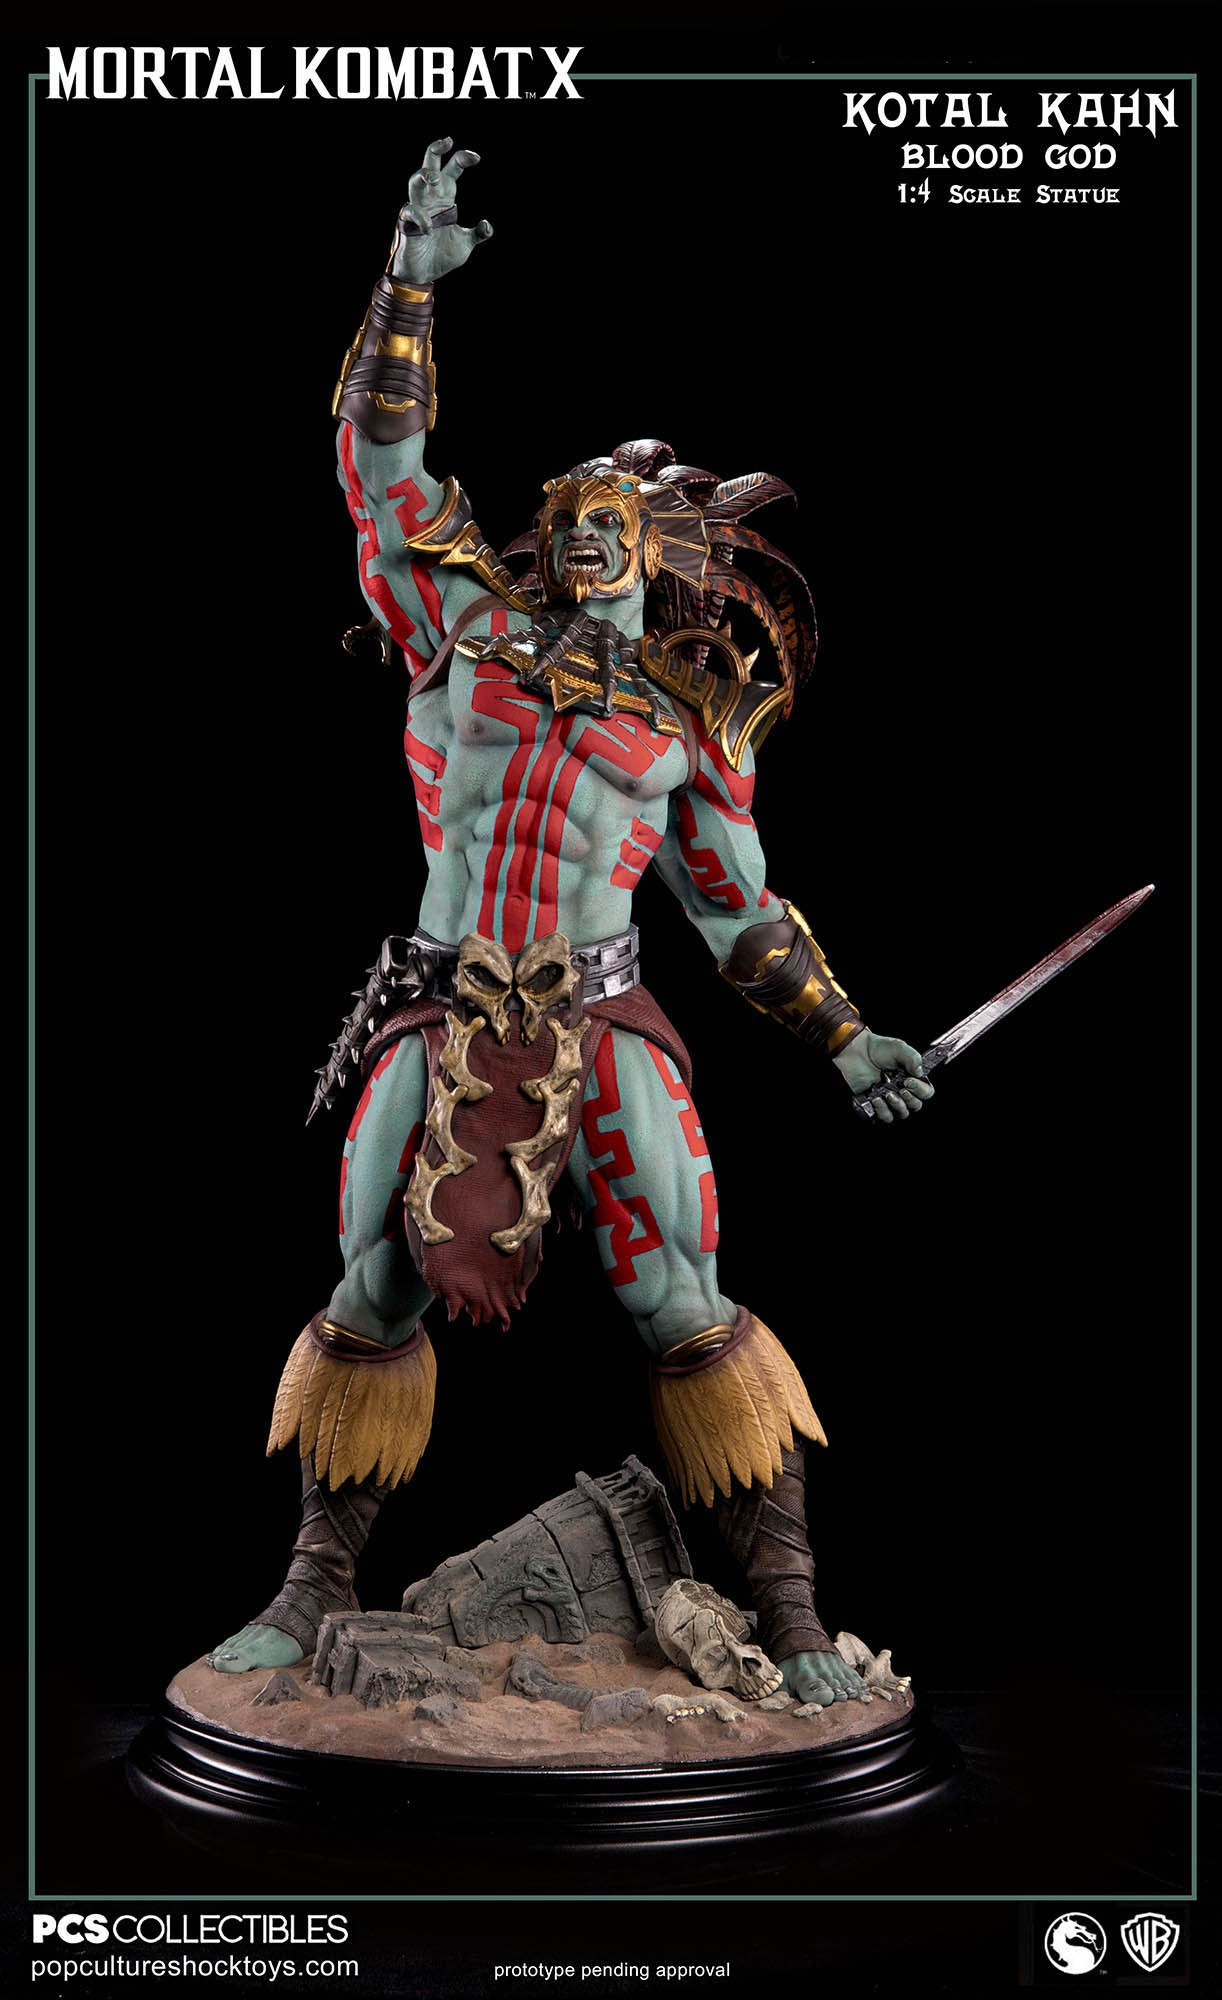 [Pop Culture Shock] Mortal Kombat X: Kotal Kahn 1:4 scale PCS-Kotal-Kahn-Blood-God-024